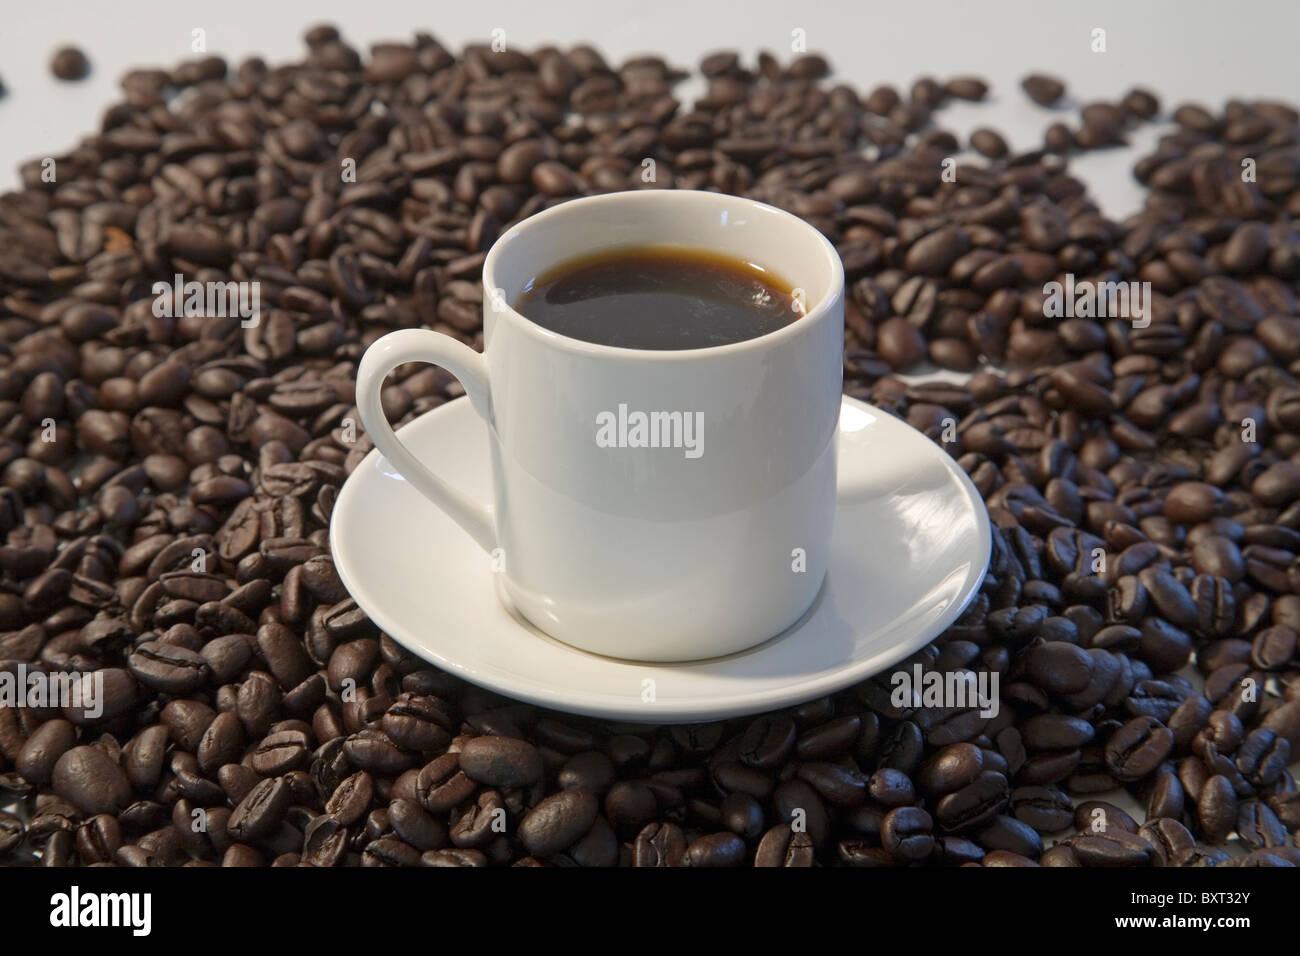 A cup of espresso with dark roast espresso beans - Stock Image